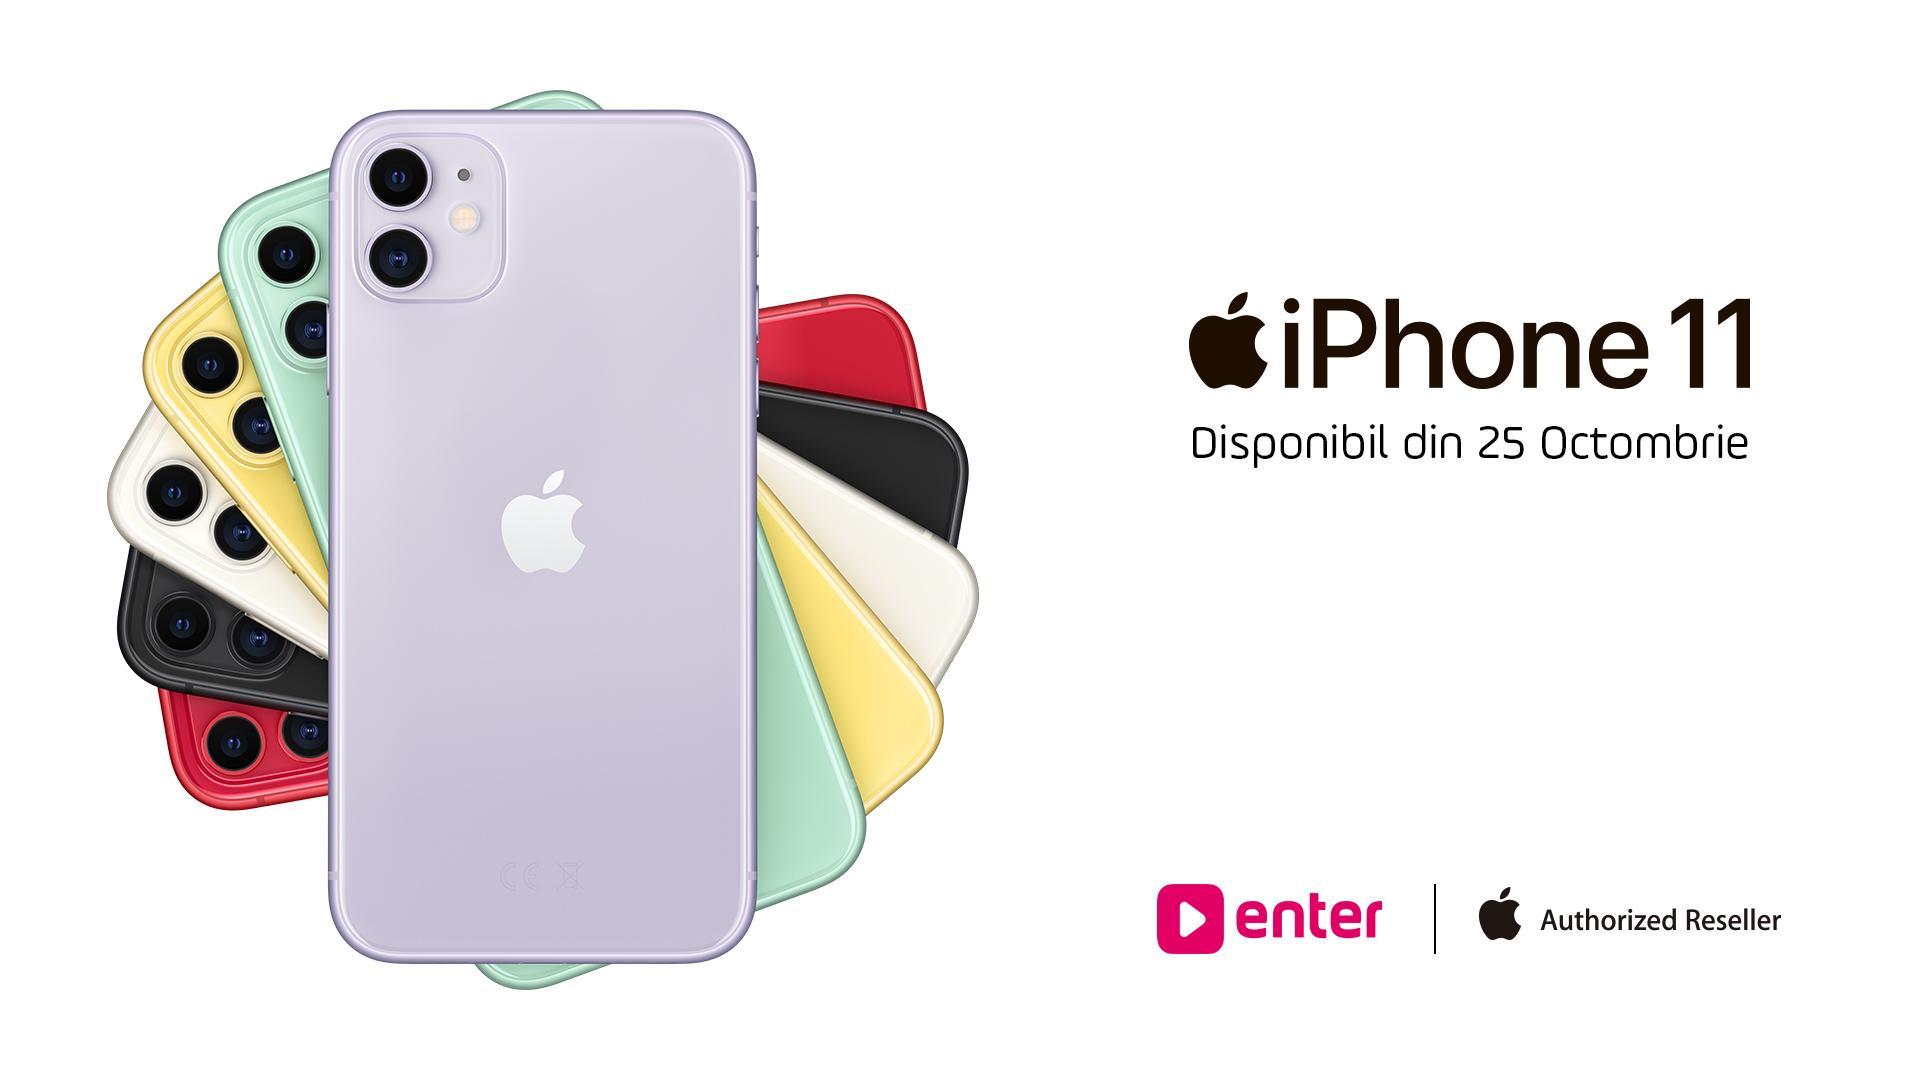 RO iPhone 11 1920_1080